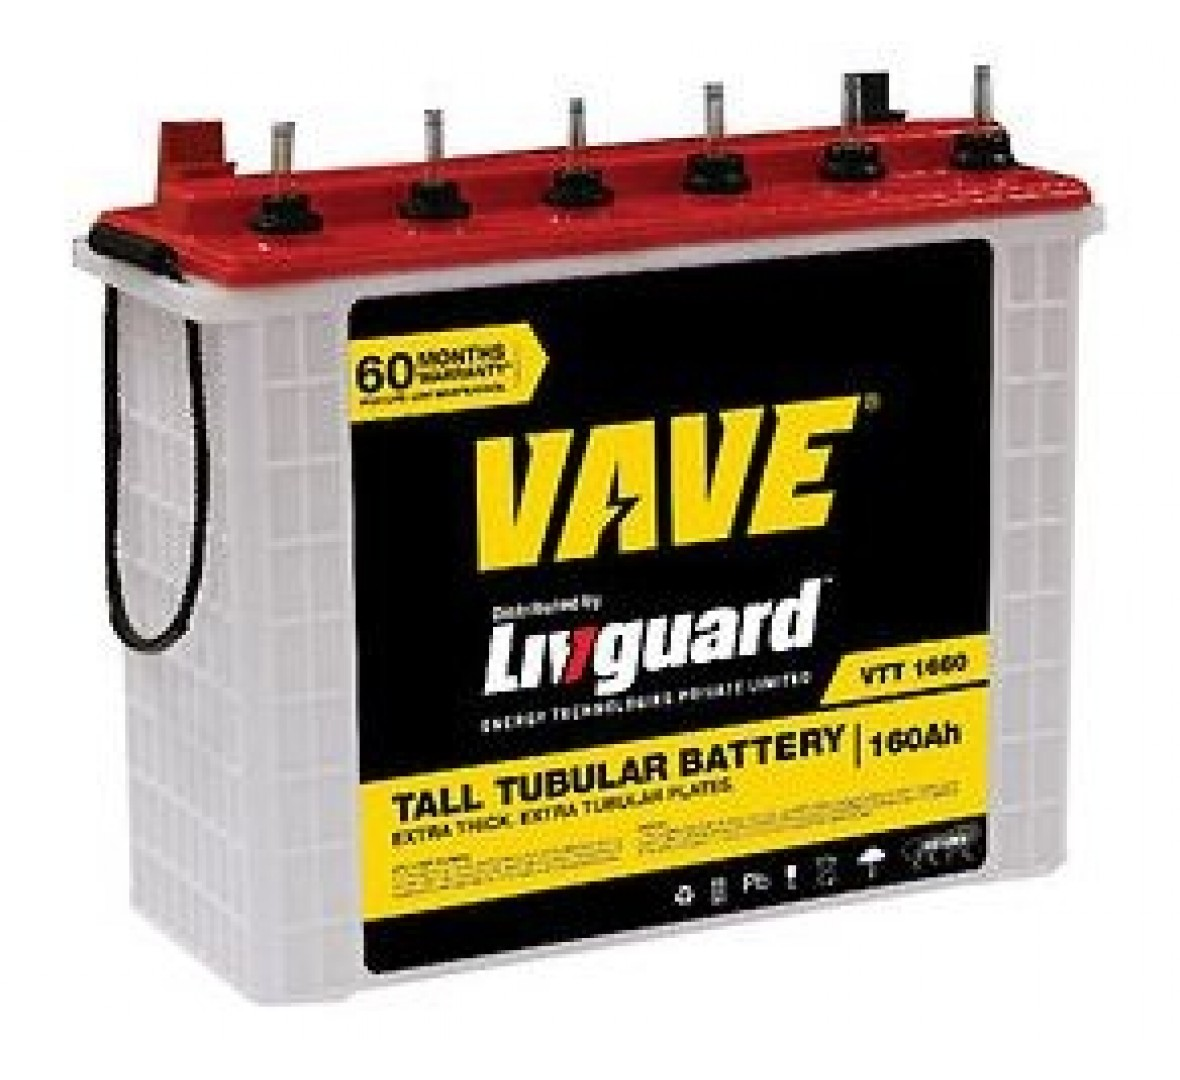 Livguard Vave Inverter Battery 160ah By Midas Group Pvt